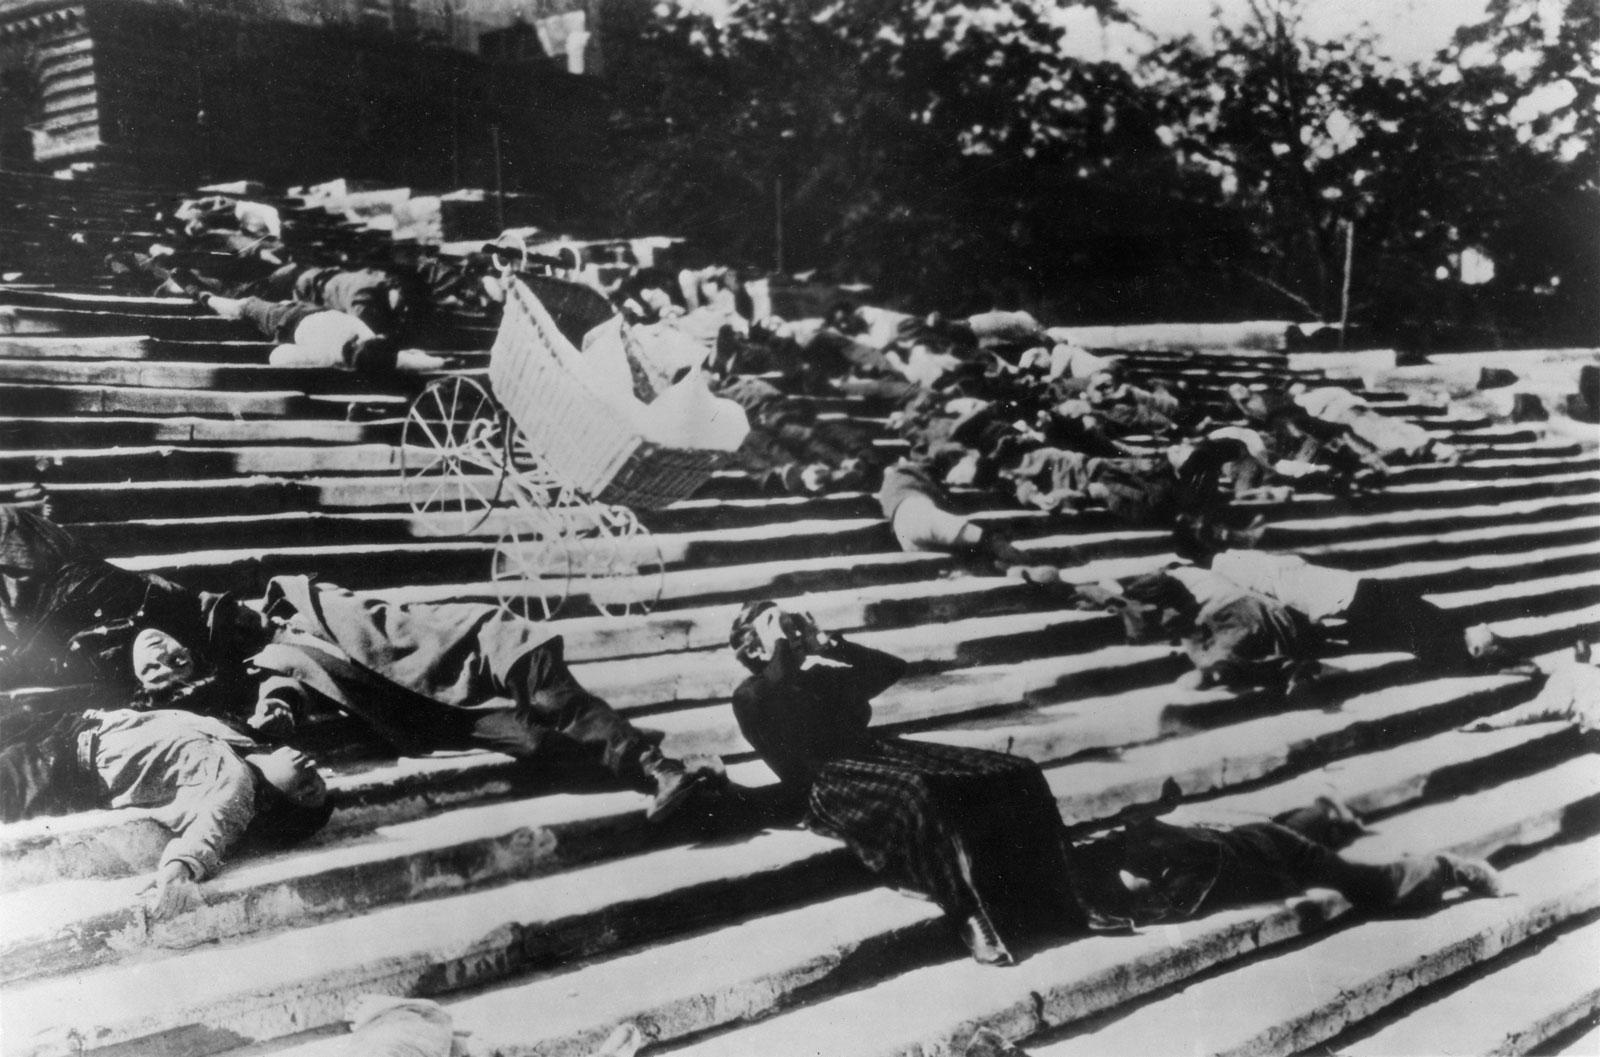 Battleship-Potemkin-sequence-The-Odessa-Steps